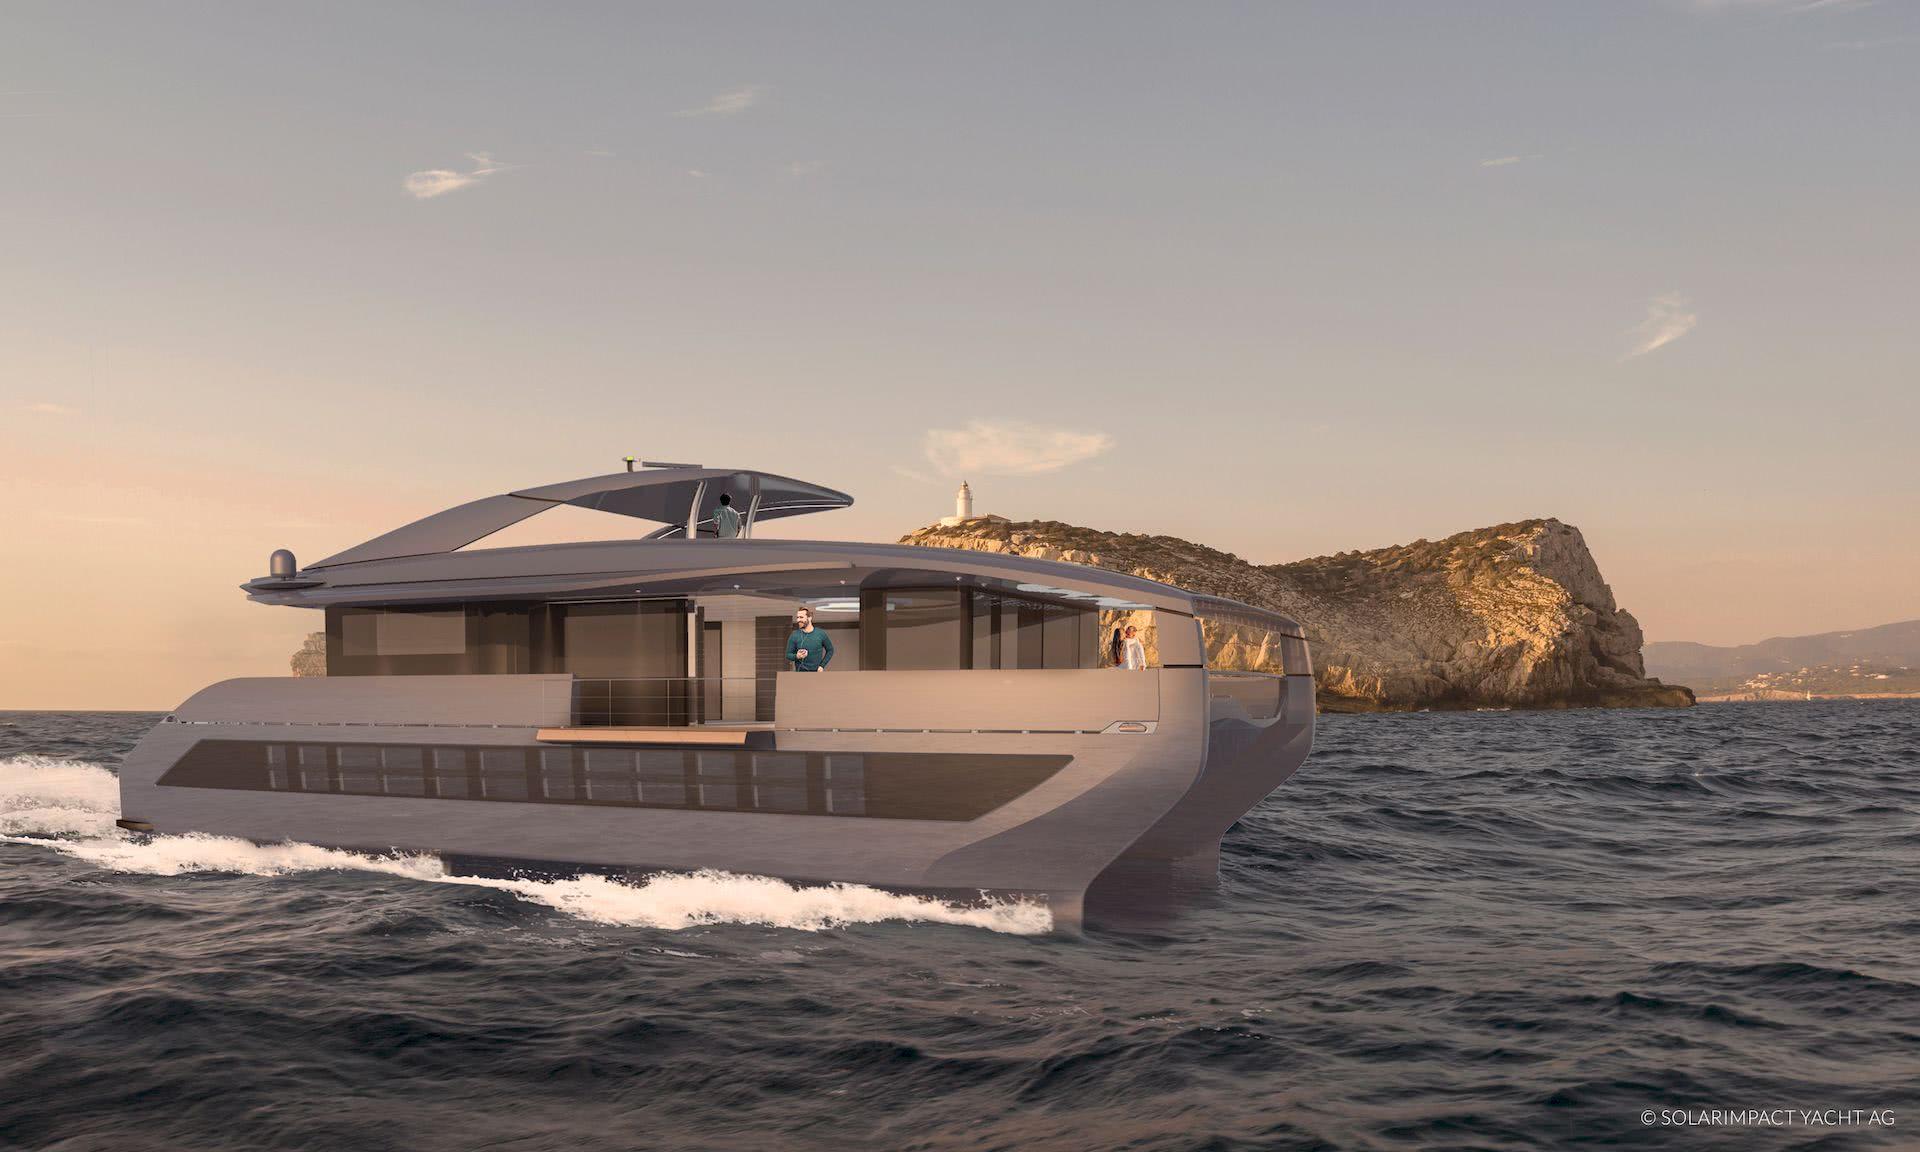 Solar Yacht Solarimpact